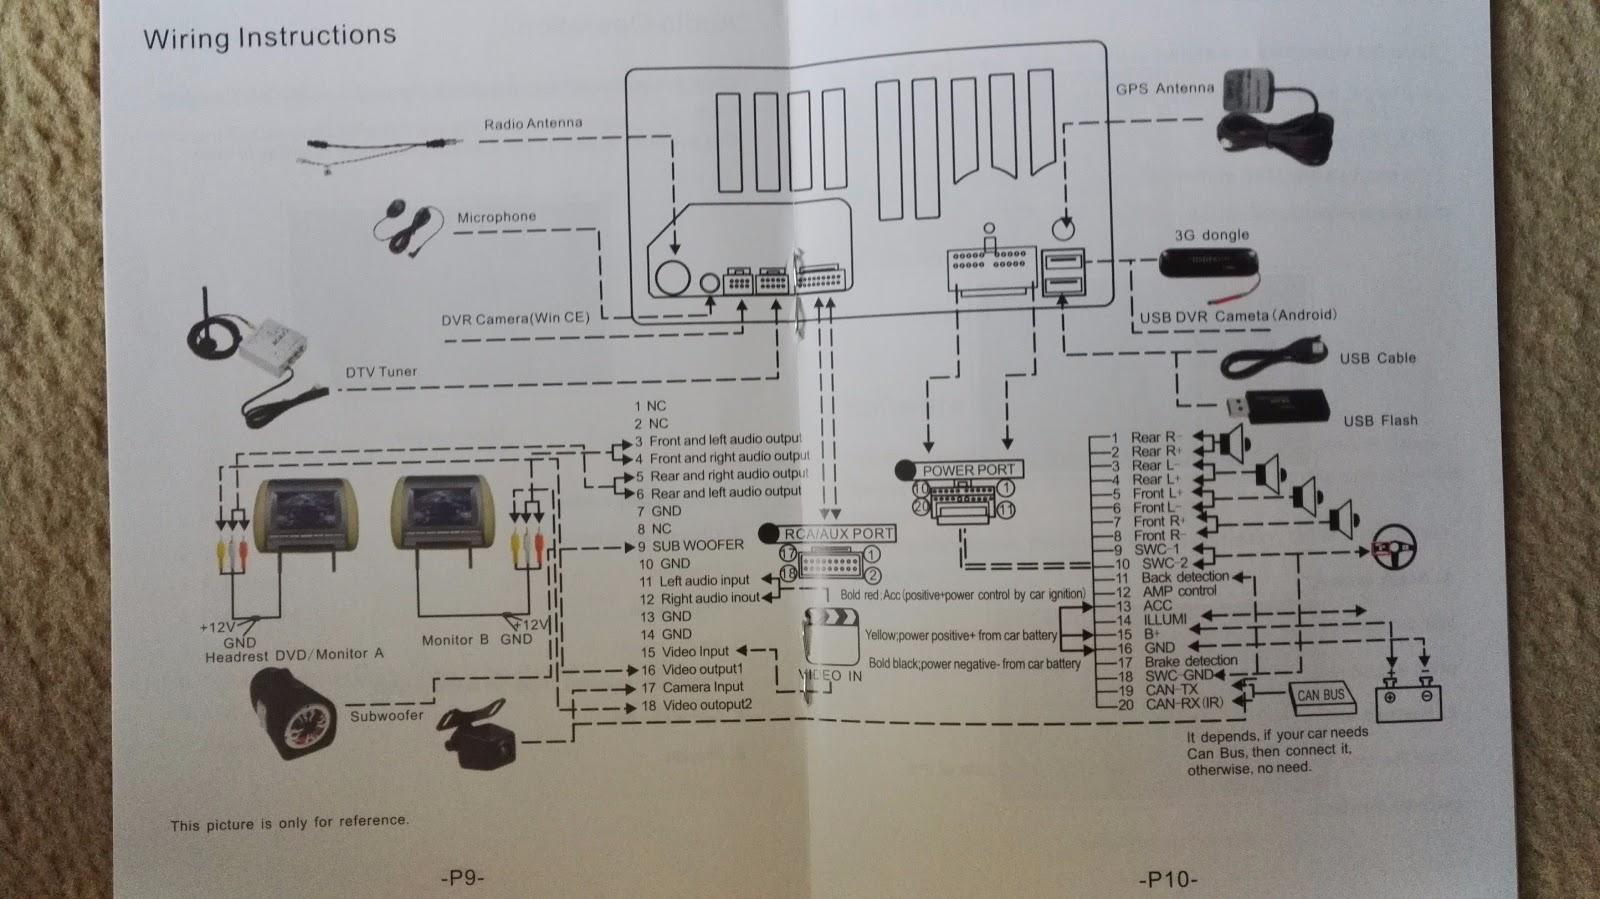 [Tuto]+[Tests]+[Avis] Autoradio Erisin ES4792B en remplacement d'un APS50 OwgygodK-MVXt5AwxTiqVMYpgI8sdwyfZMb-6ObqCSR5qMTFBJVByXo9mbtyvj4R7LUvq3URbt-qgD875TE8DzDvALZUl1sE1oKU6S6dFvD6LCfECdjwatV5Uzmkn5fmc902XSFo